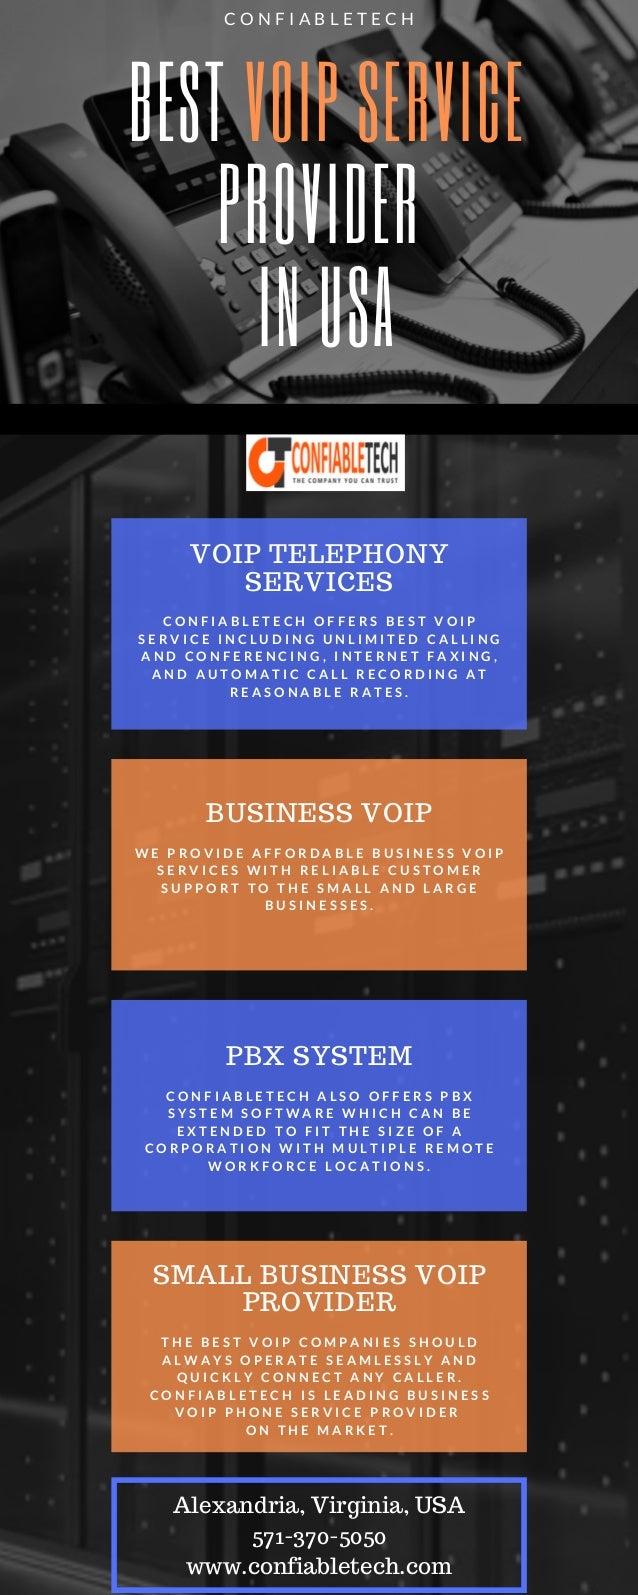 Best Voip Service >> Confiabletech Best Voip Service Provider In Usa